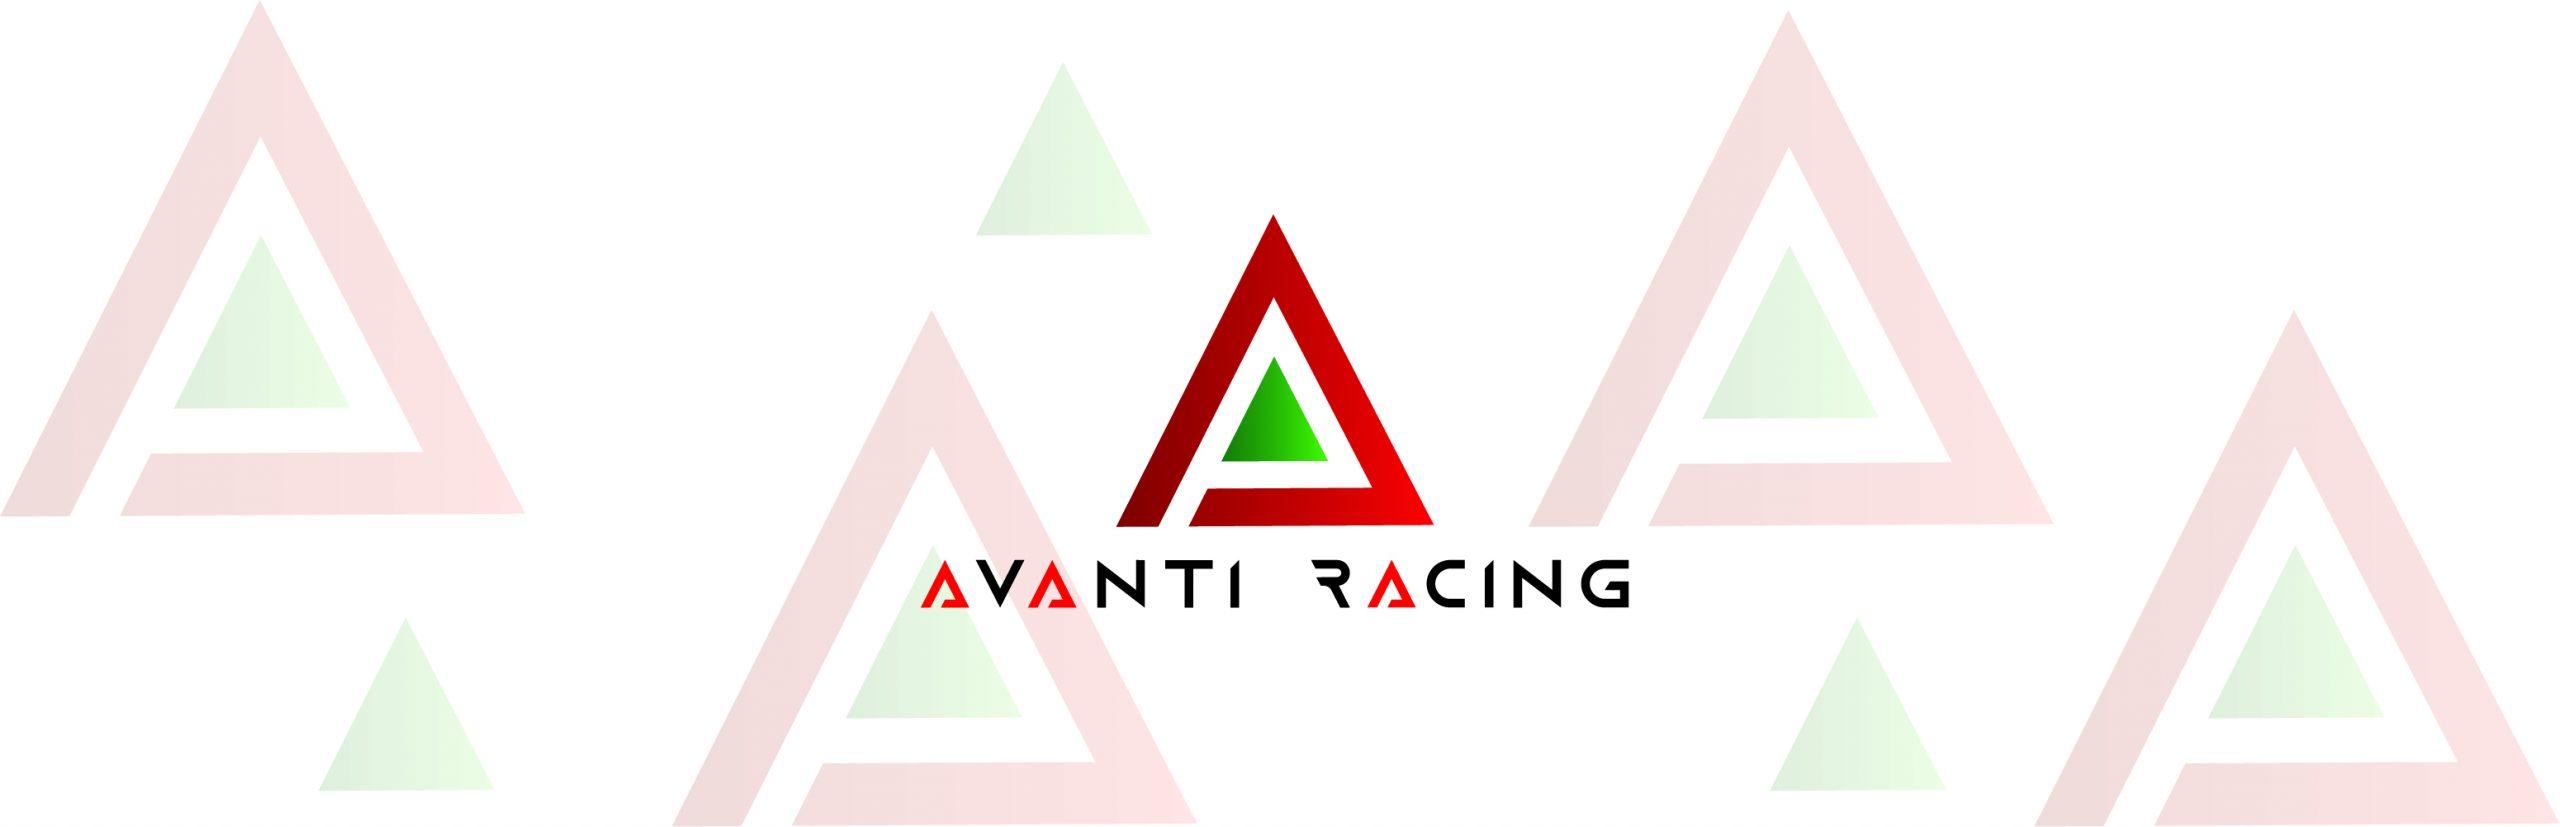 Background Avanti Racing